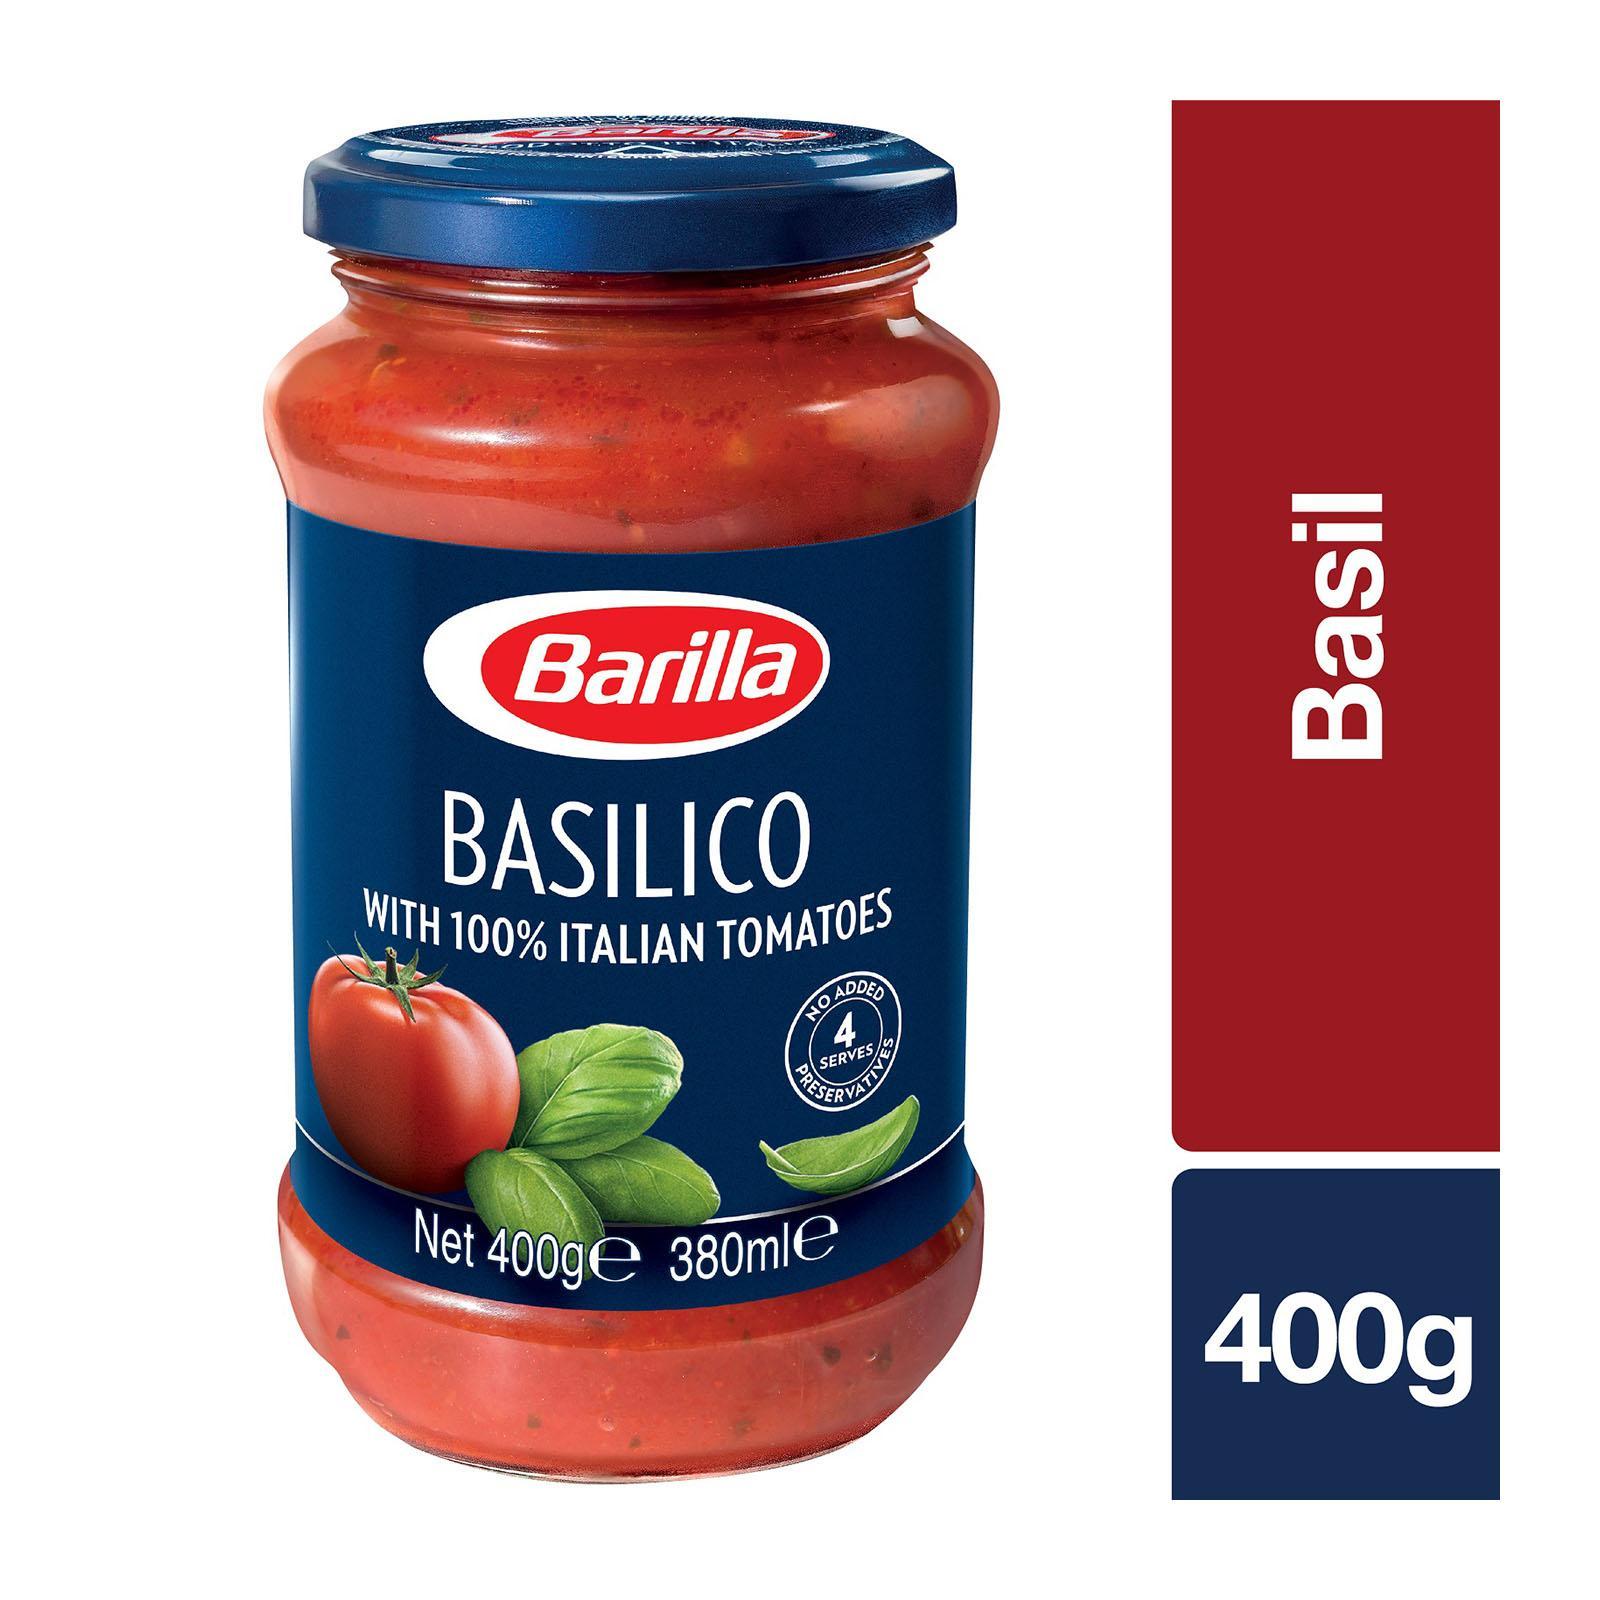 Barilla Basilico Pasta Sauce